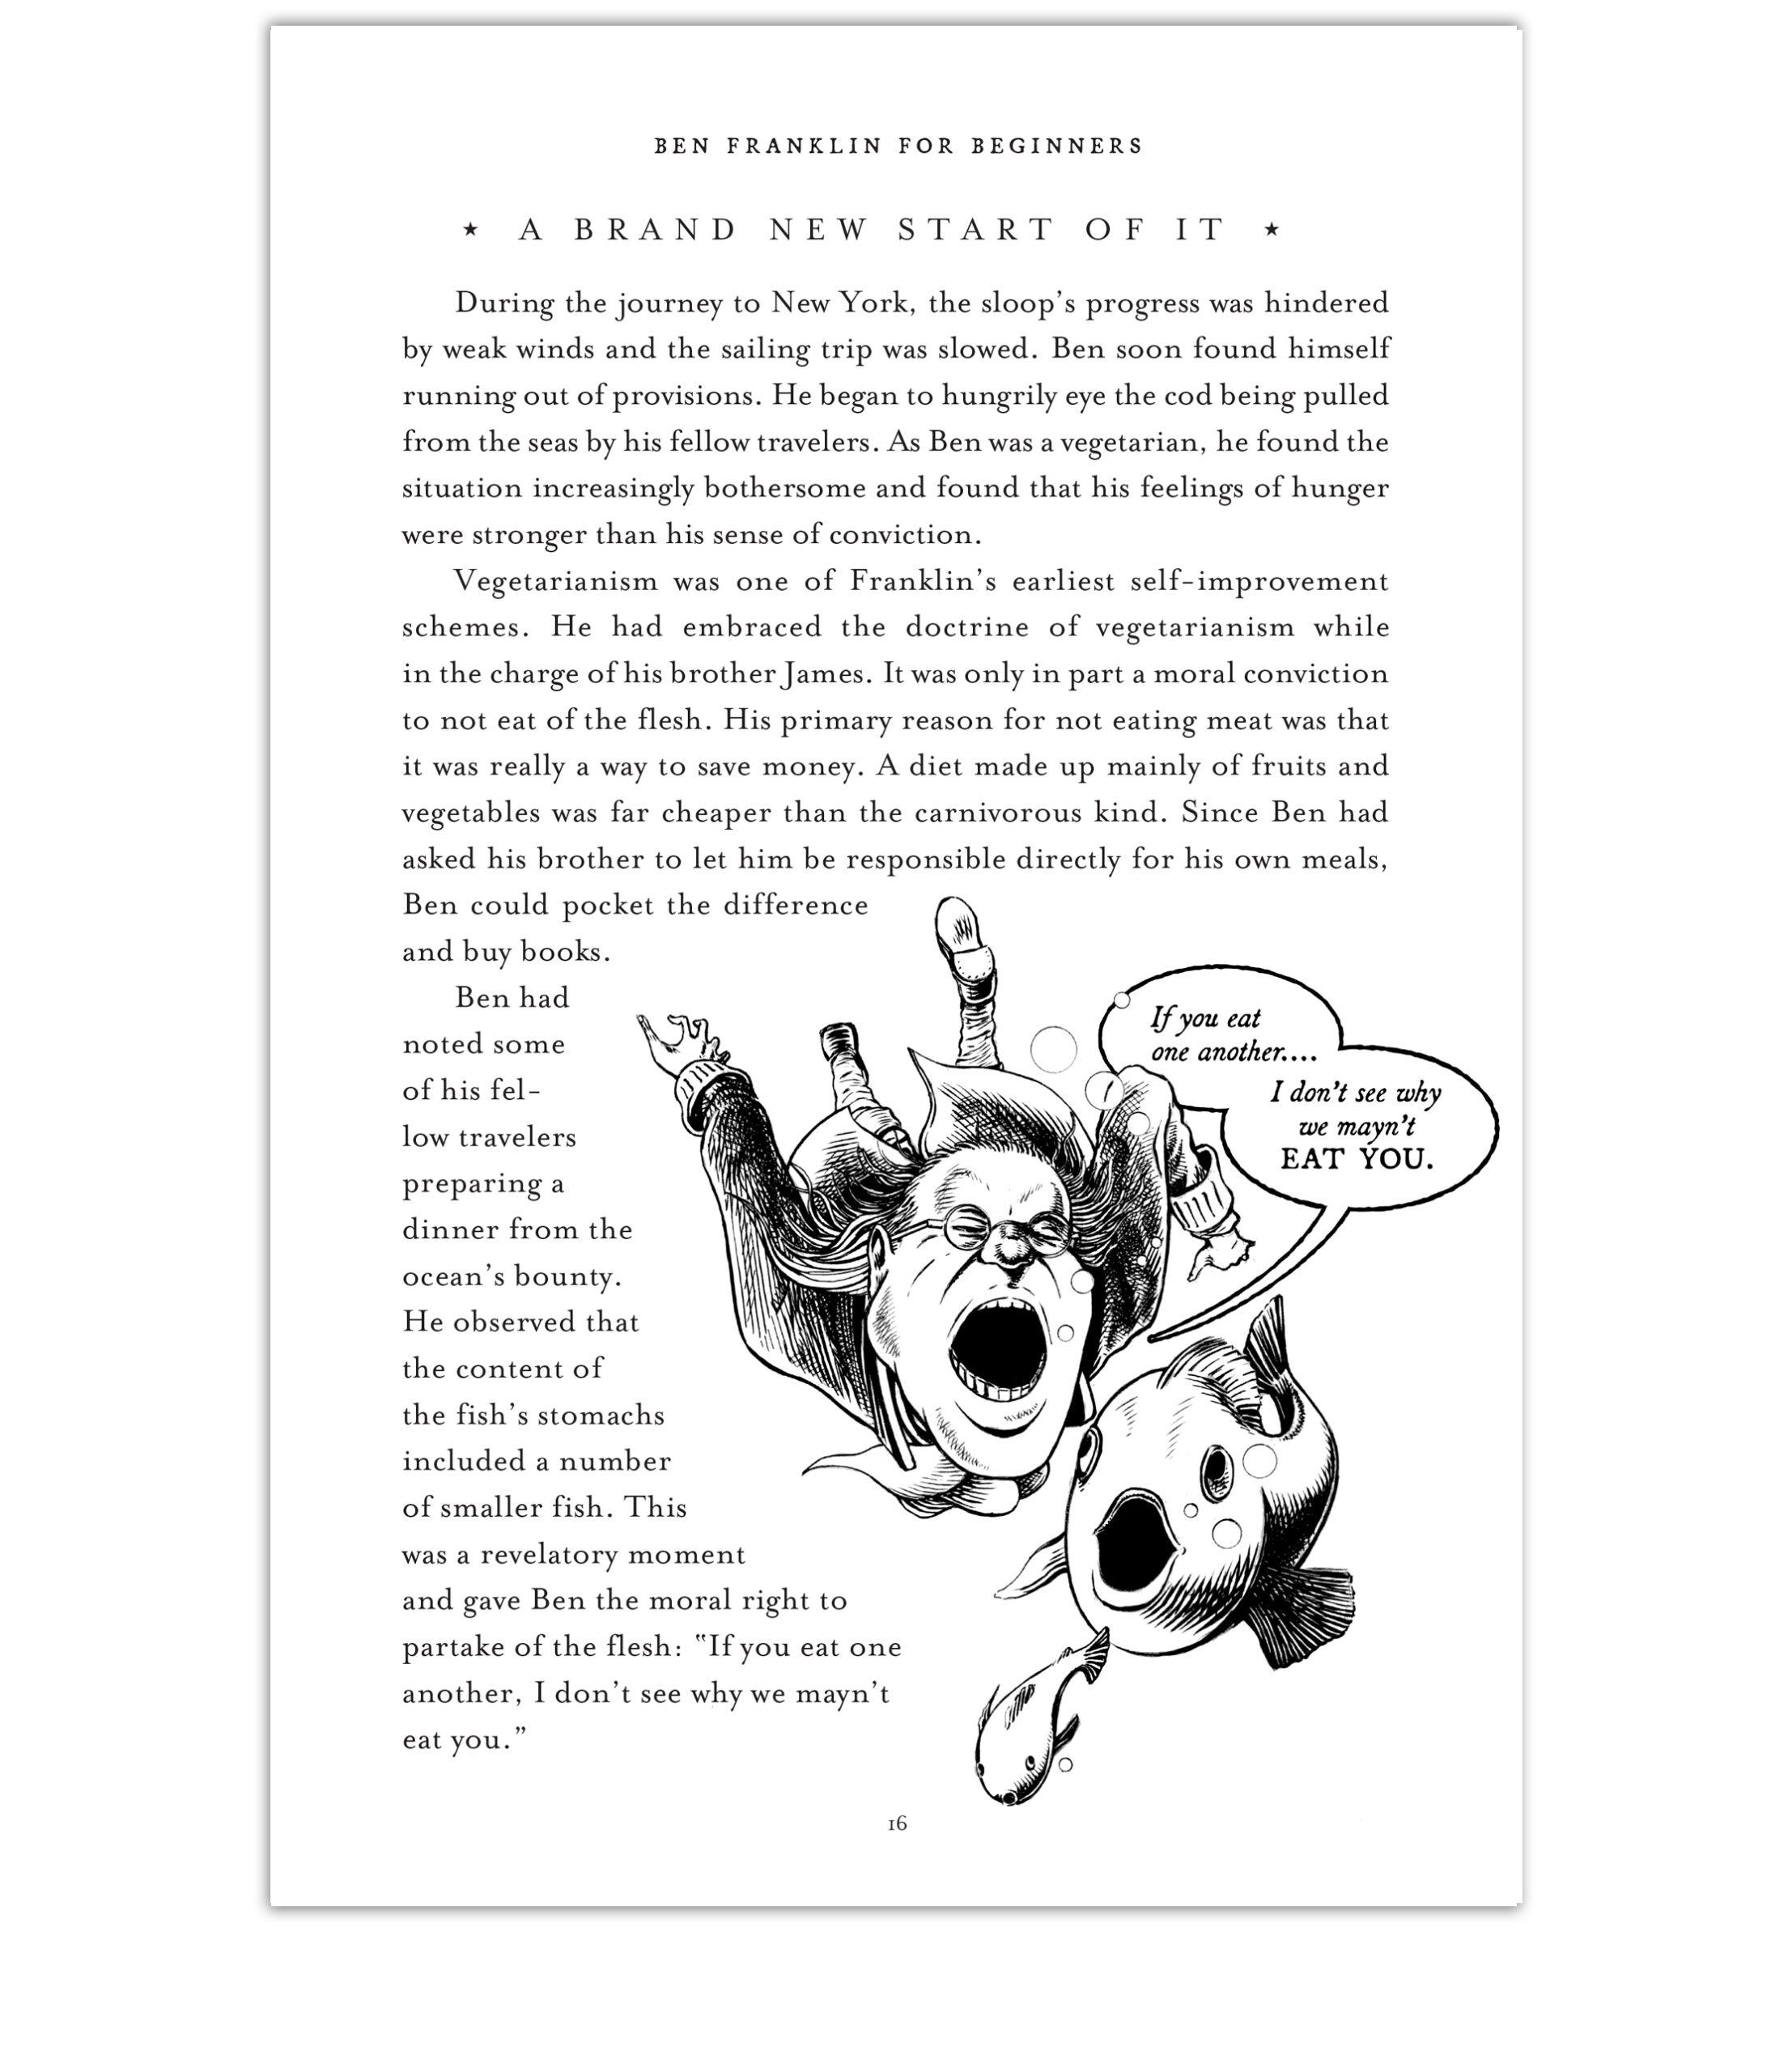 Ben Franklin for Beginners p. 16